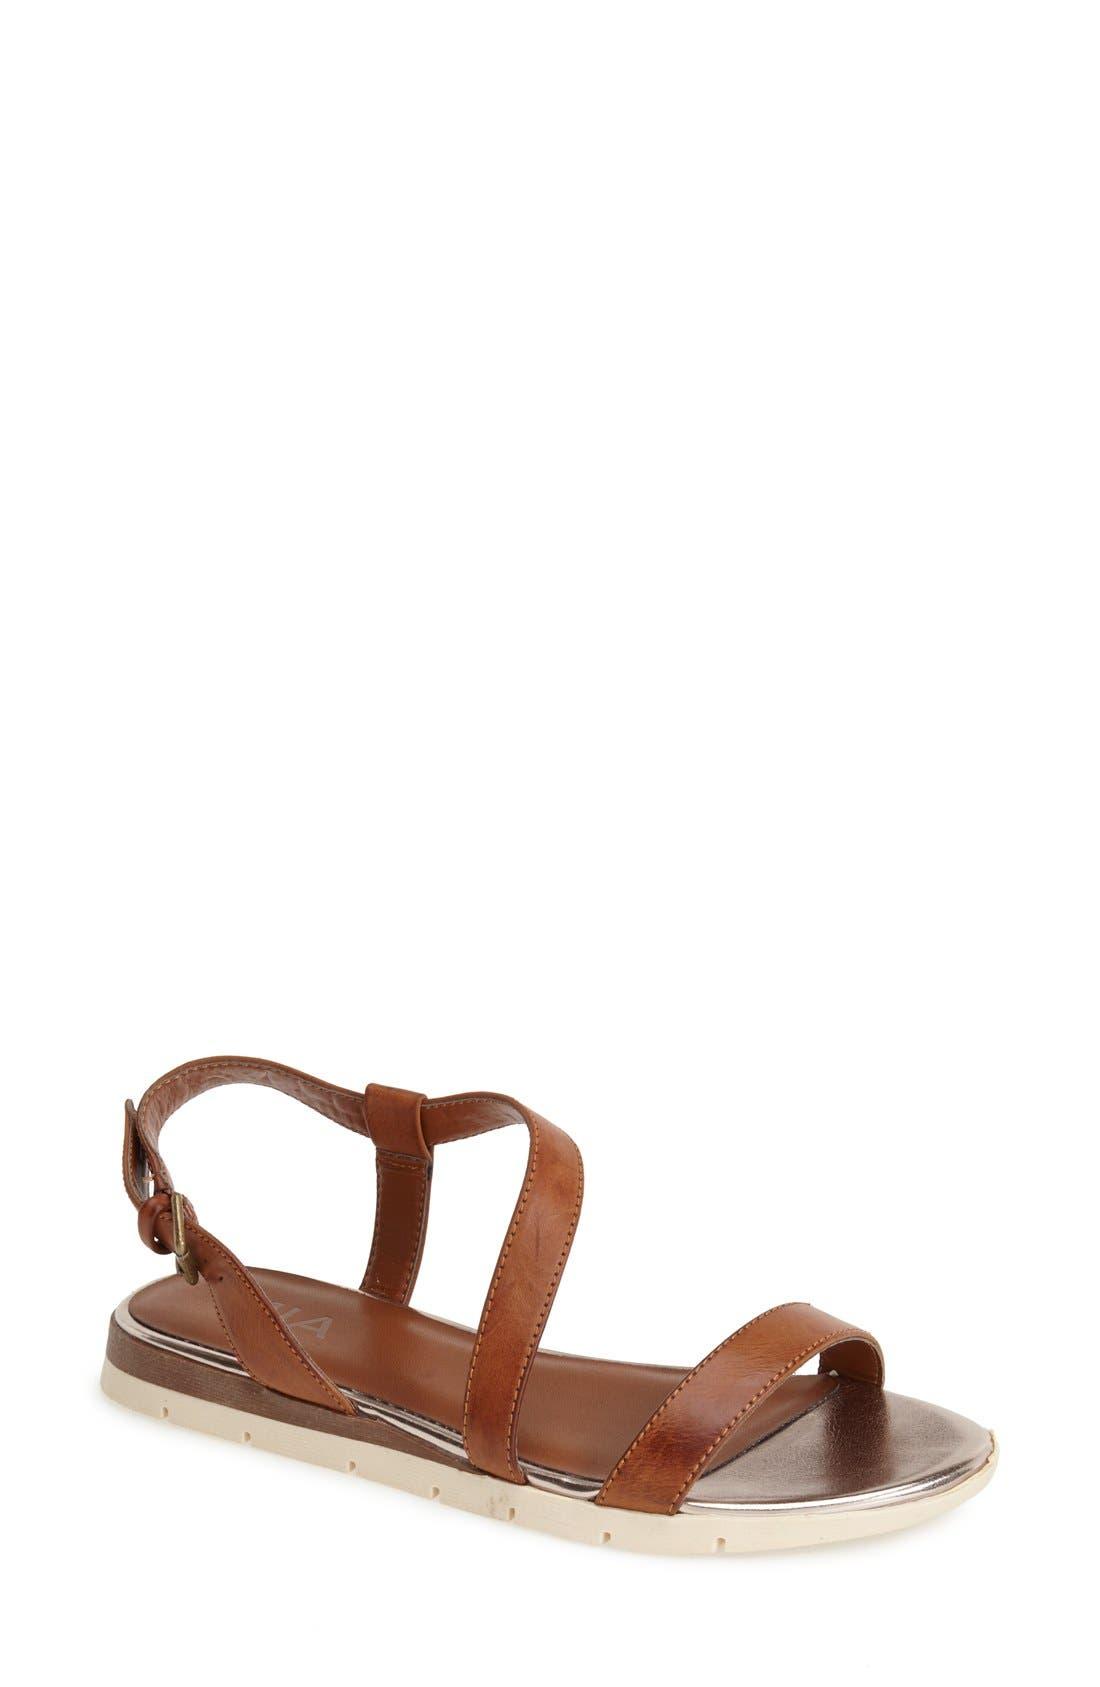 Main Image - MIA 'Baseline' Slingback Flat Sandal (Women)